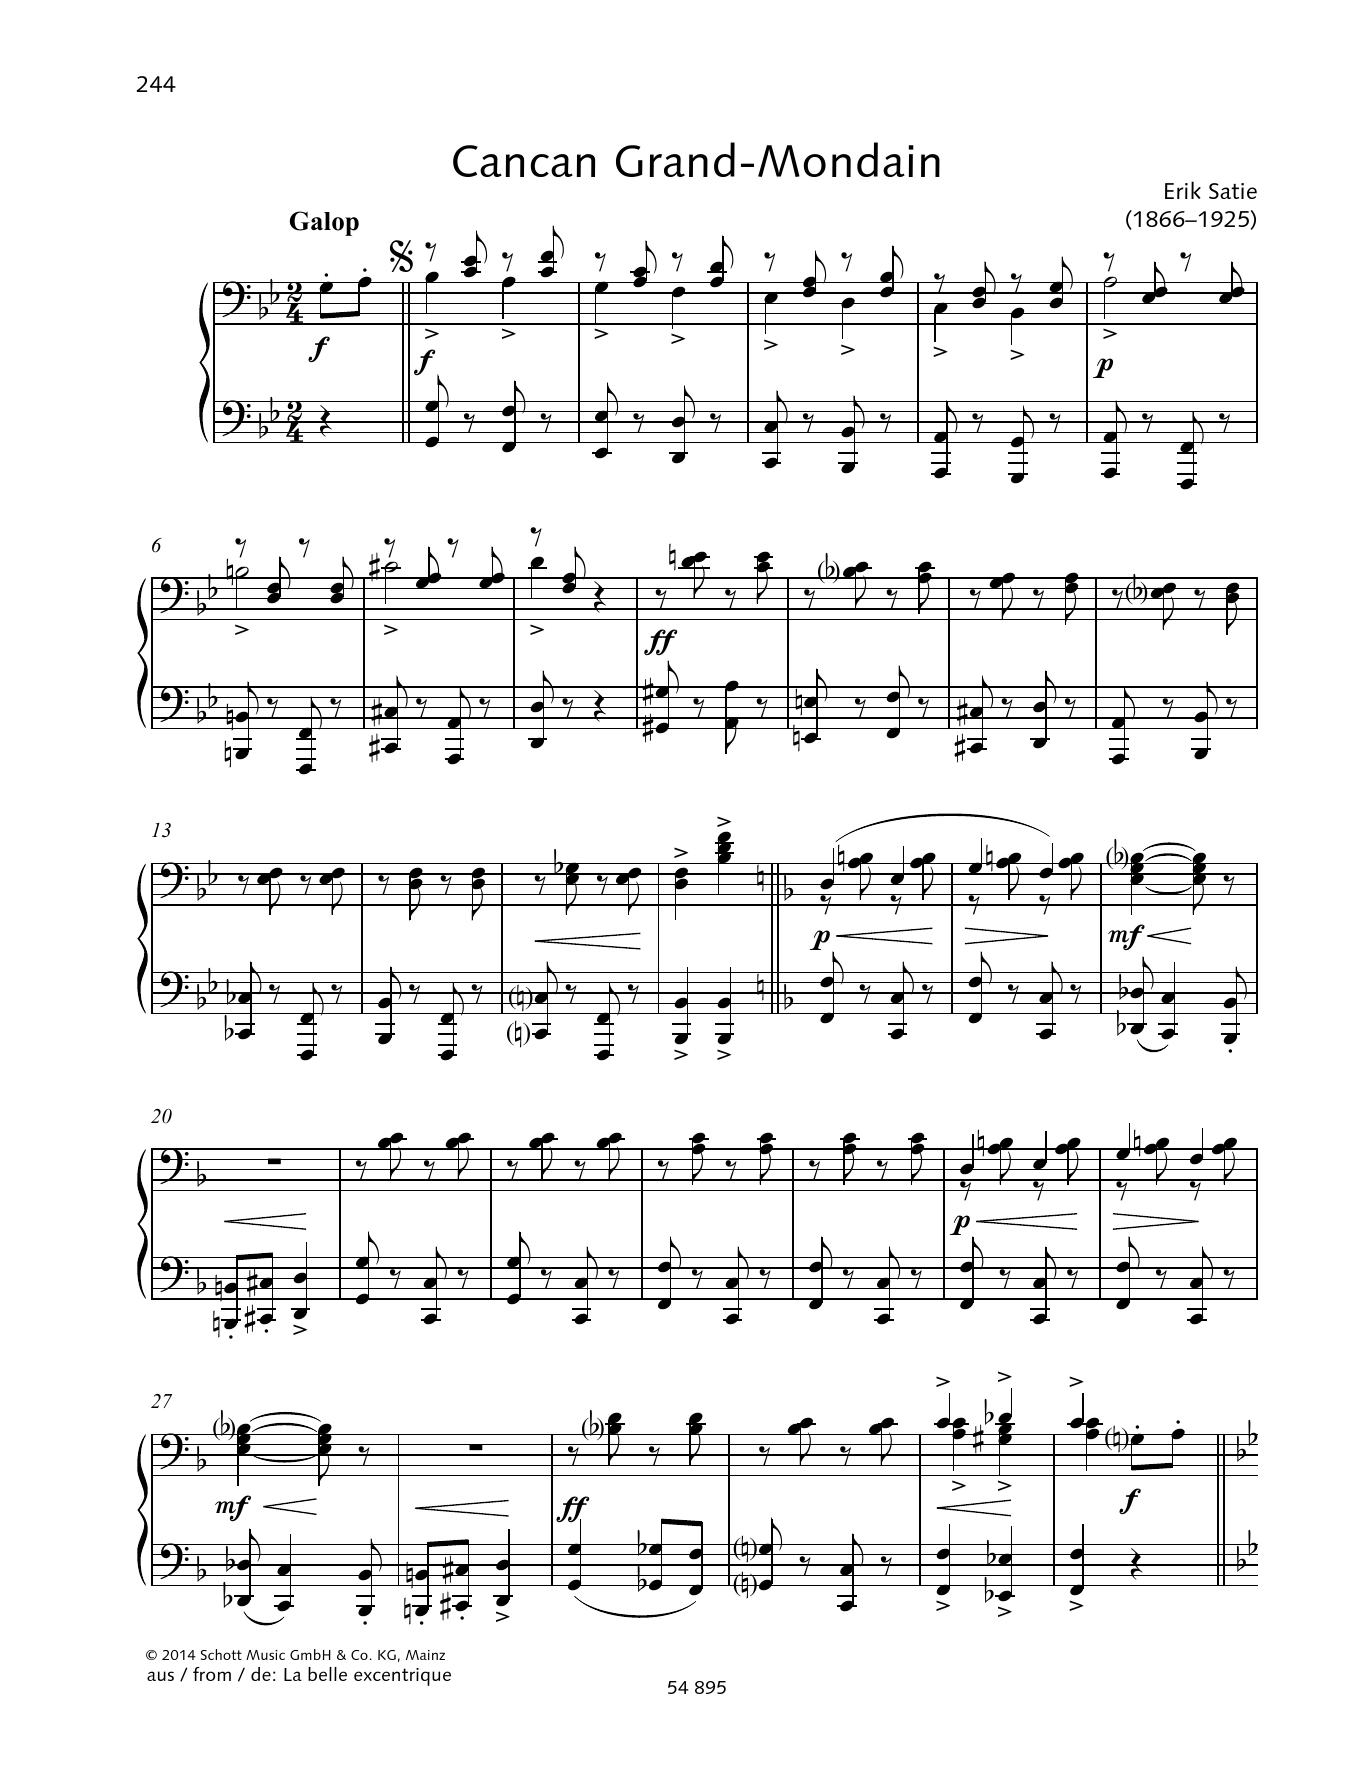 Cancan Grand-Mondain Sheet Music